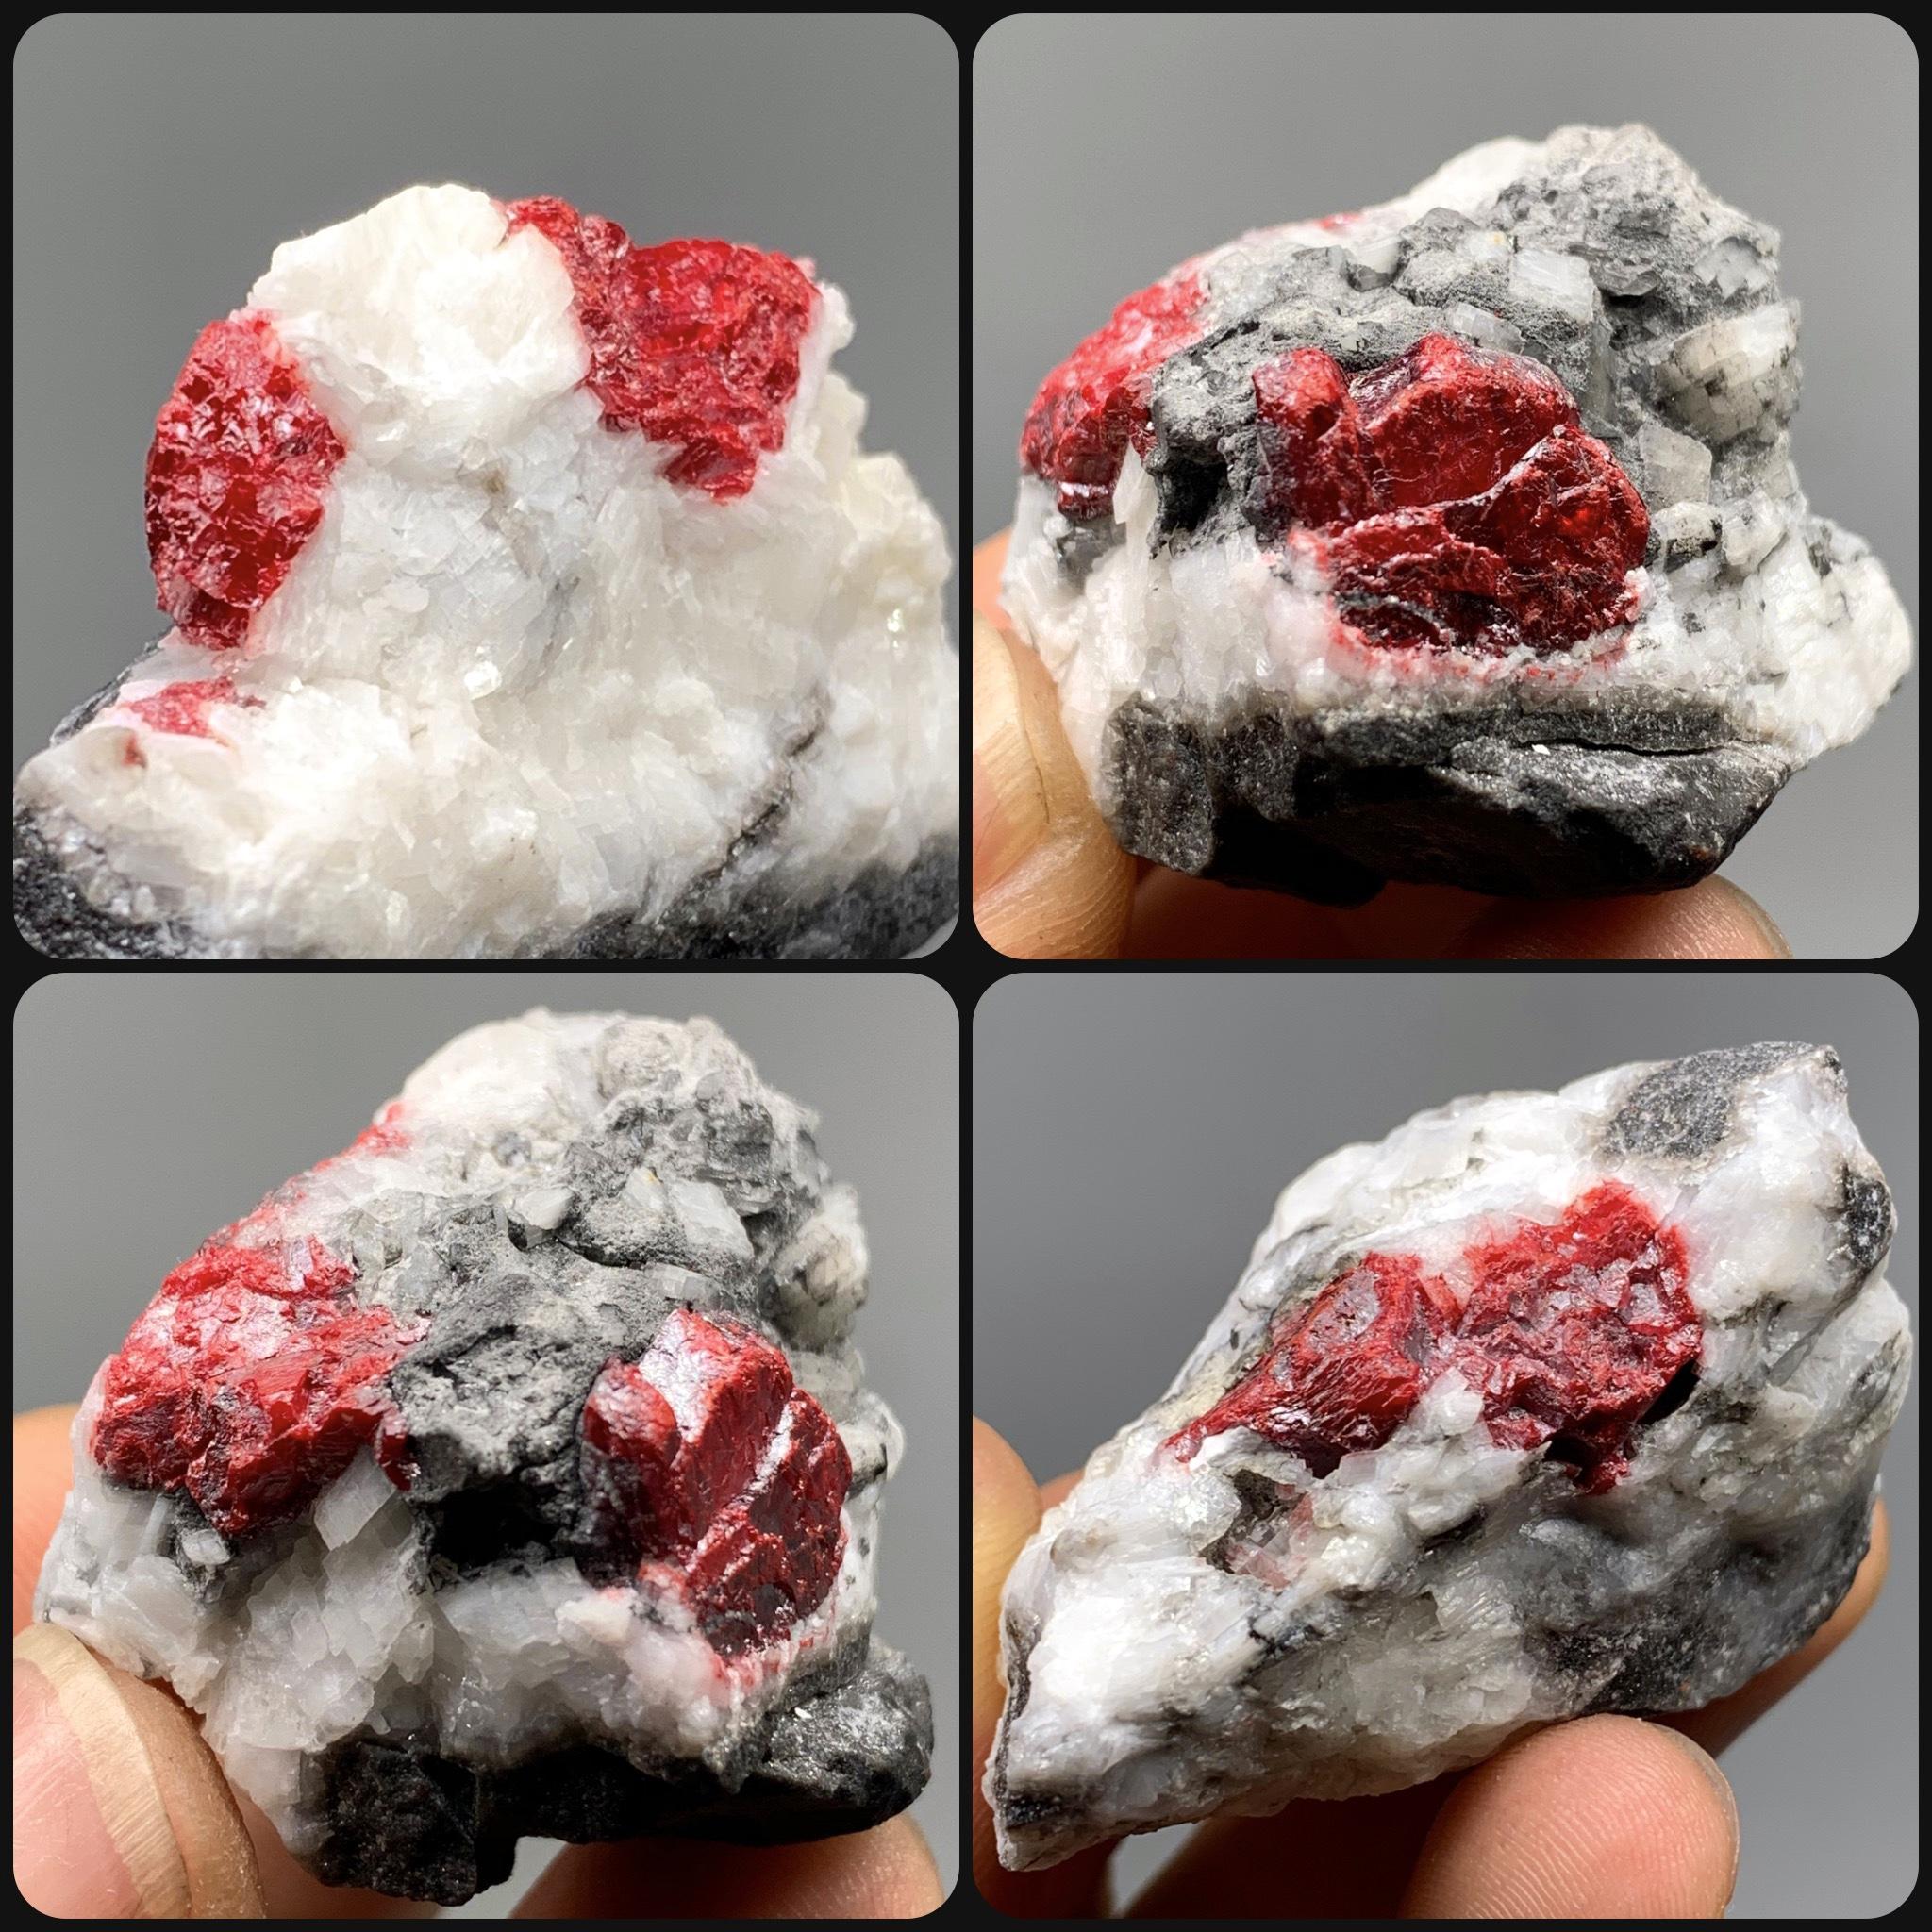 Кристаллы / Камни Артикул 614739014114